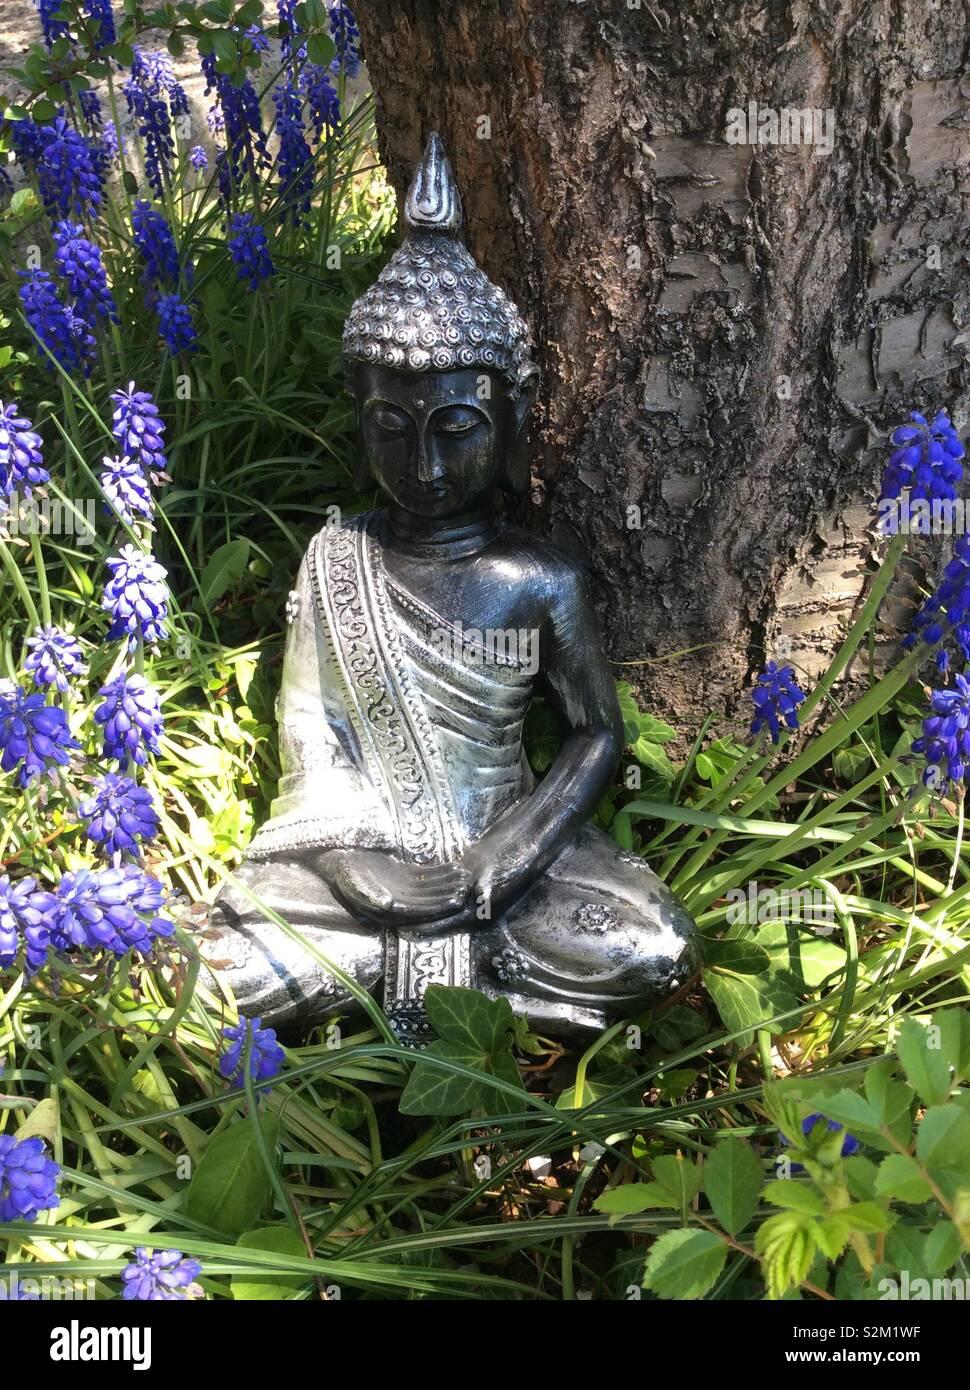 Meditation Buddha Statue Im Garten Stockfoto Bild 311456475 Alamy